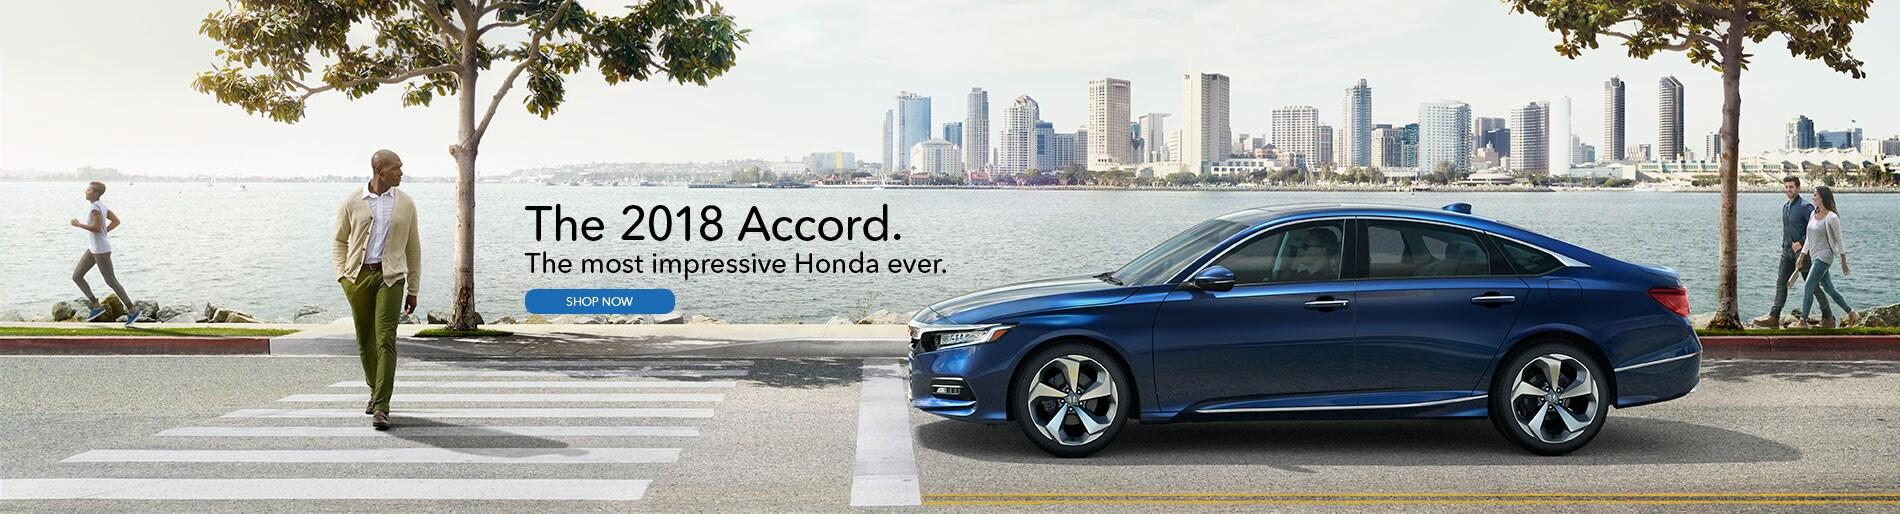 Joe Morgan Honda In Monroe Oh New Used Car Dealership Serving Engine Coolant Change Previous Next